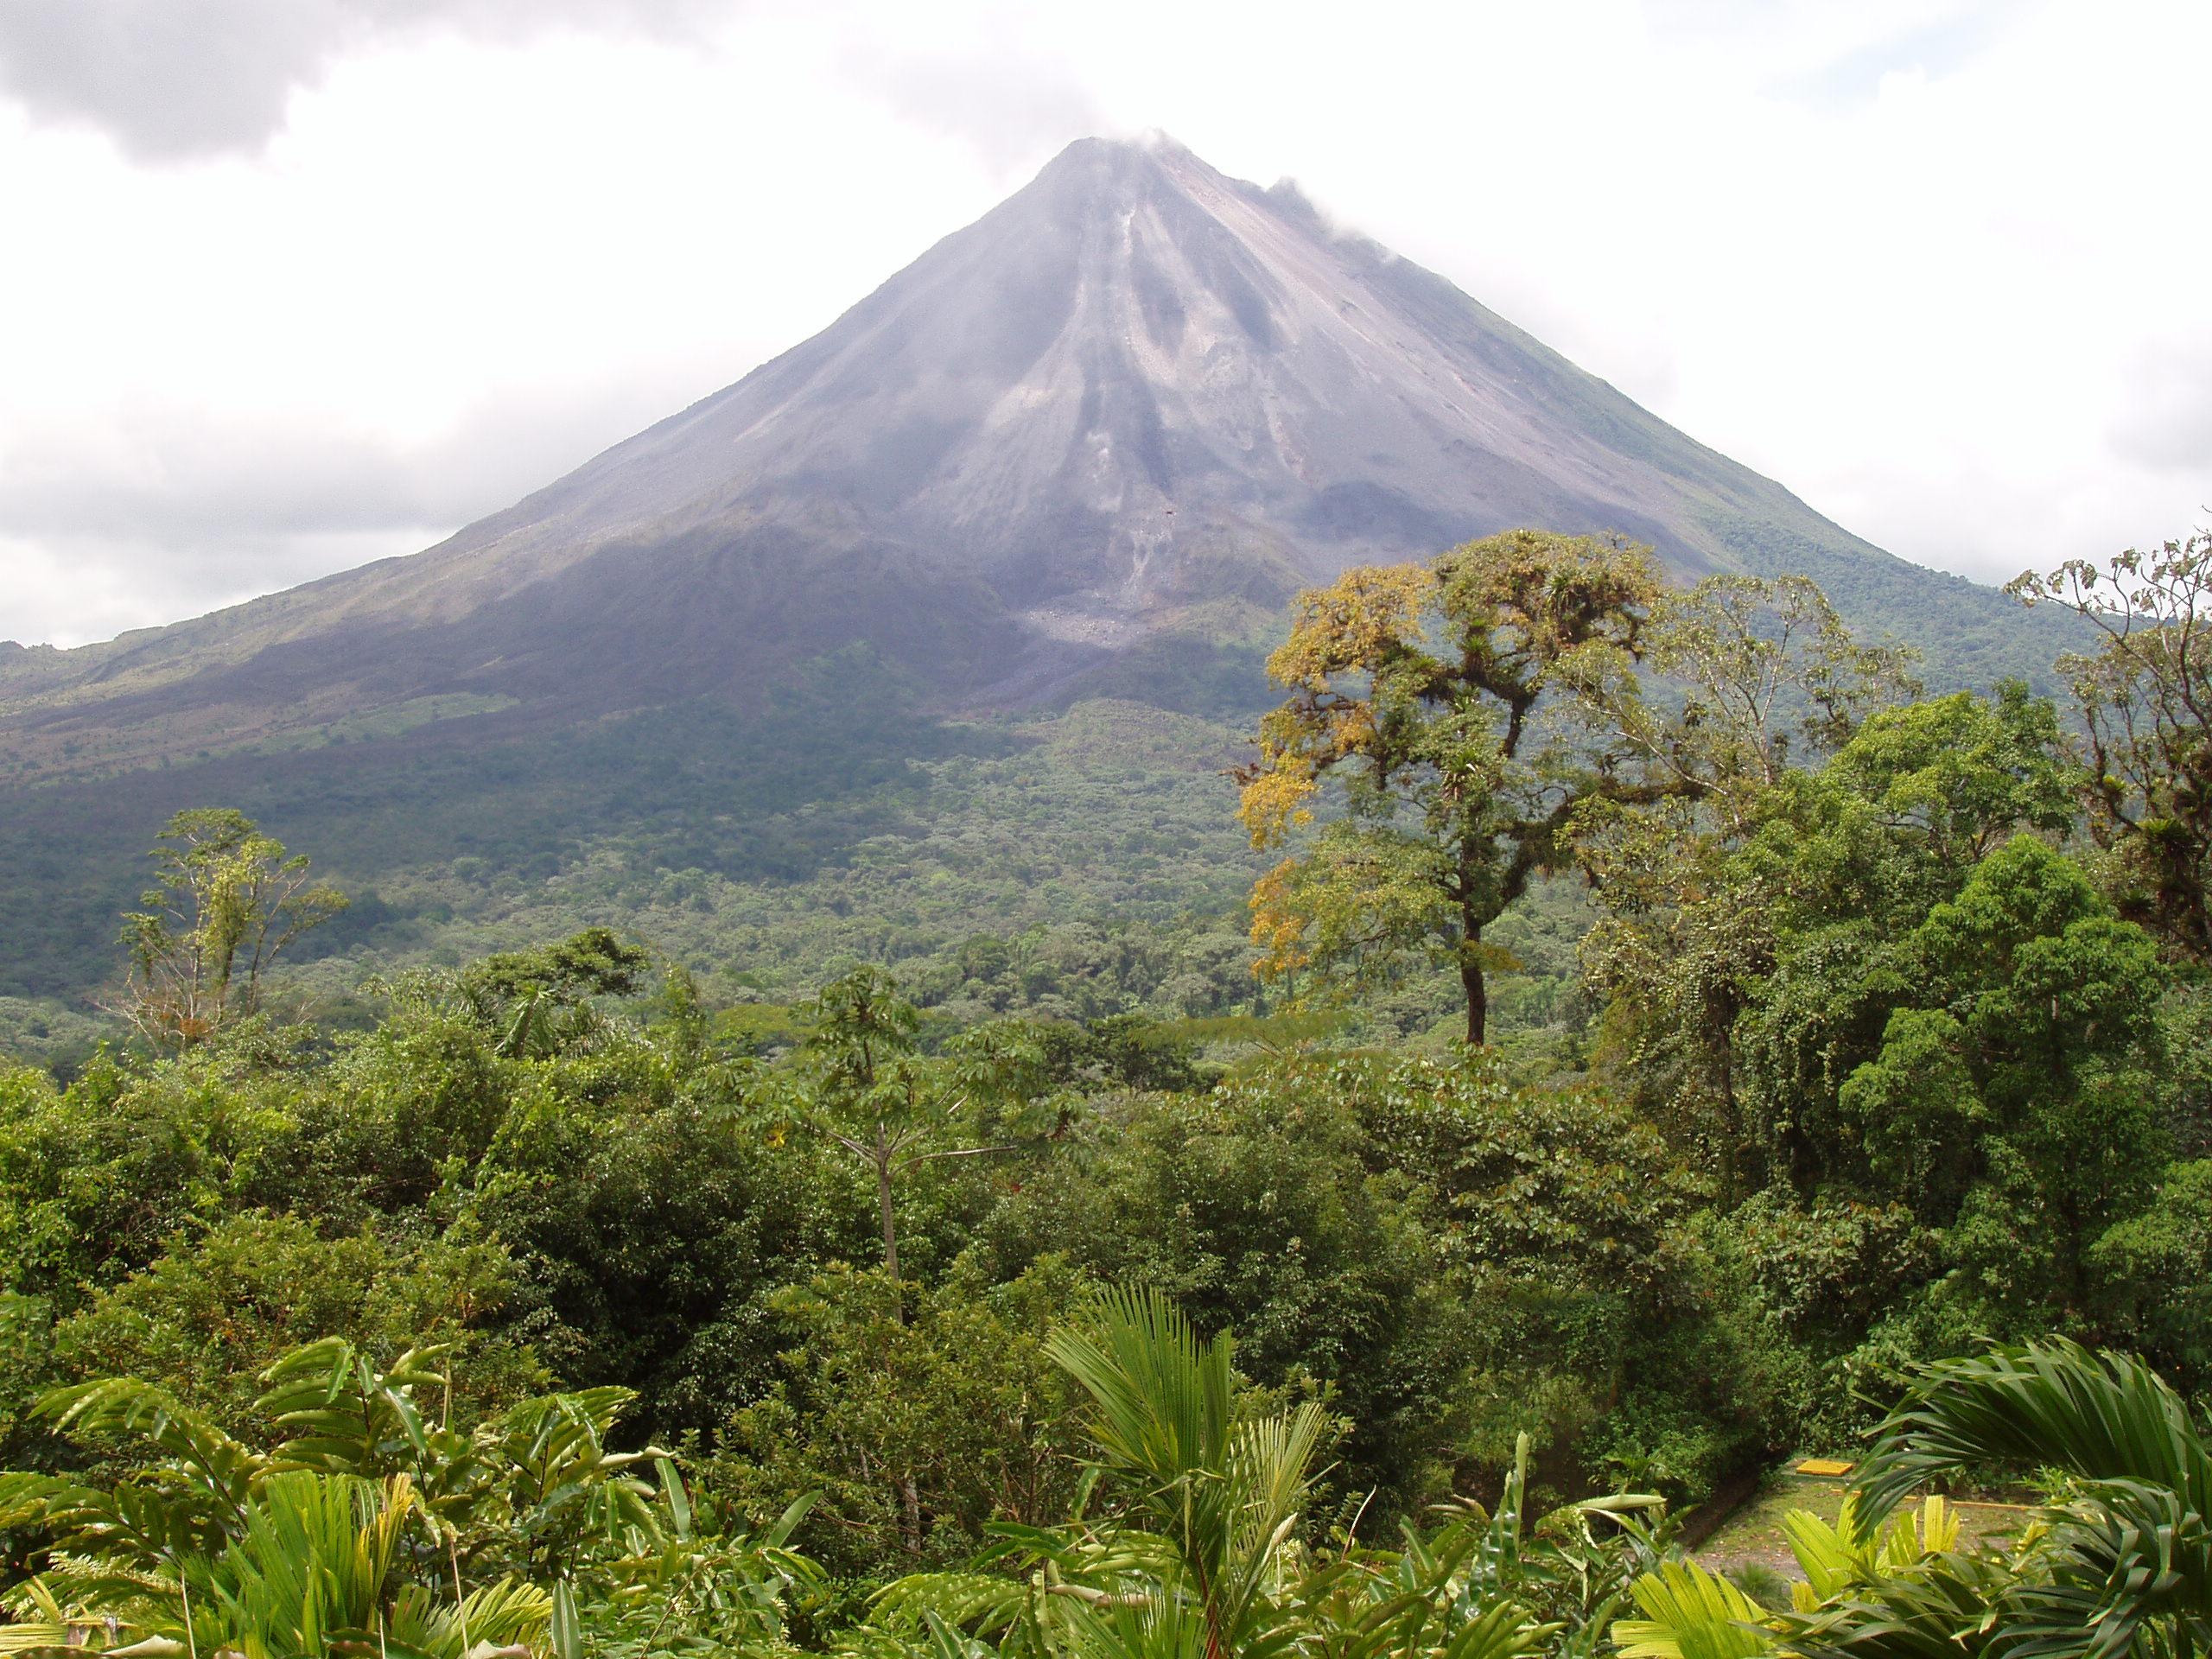 p1010060.jpg - Volcano